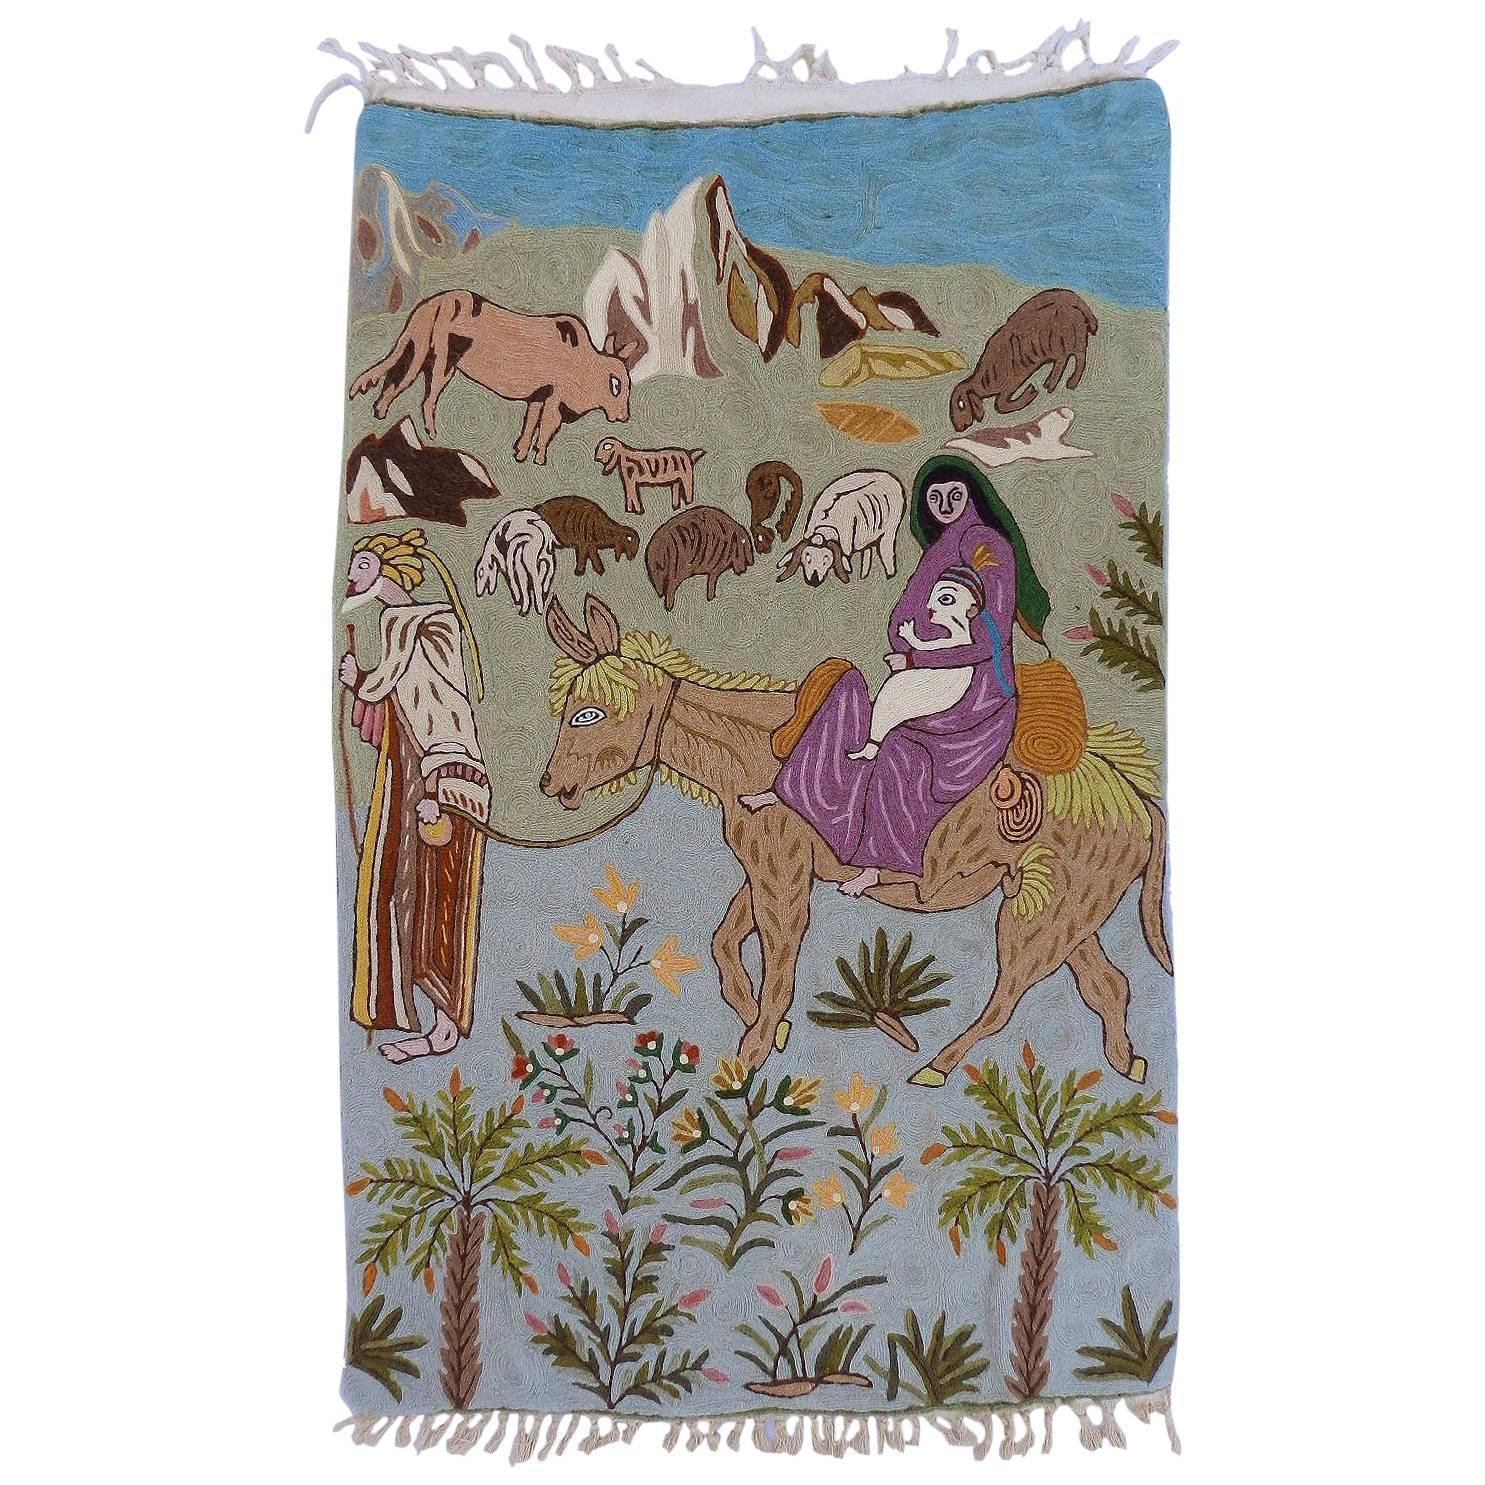 Mid century Tapestry Wall Hanging Crewelwork Naive Folk Art Nativity Basque Mary